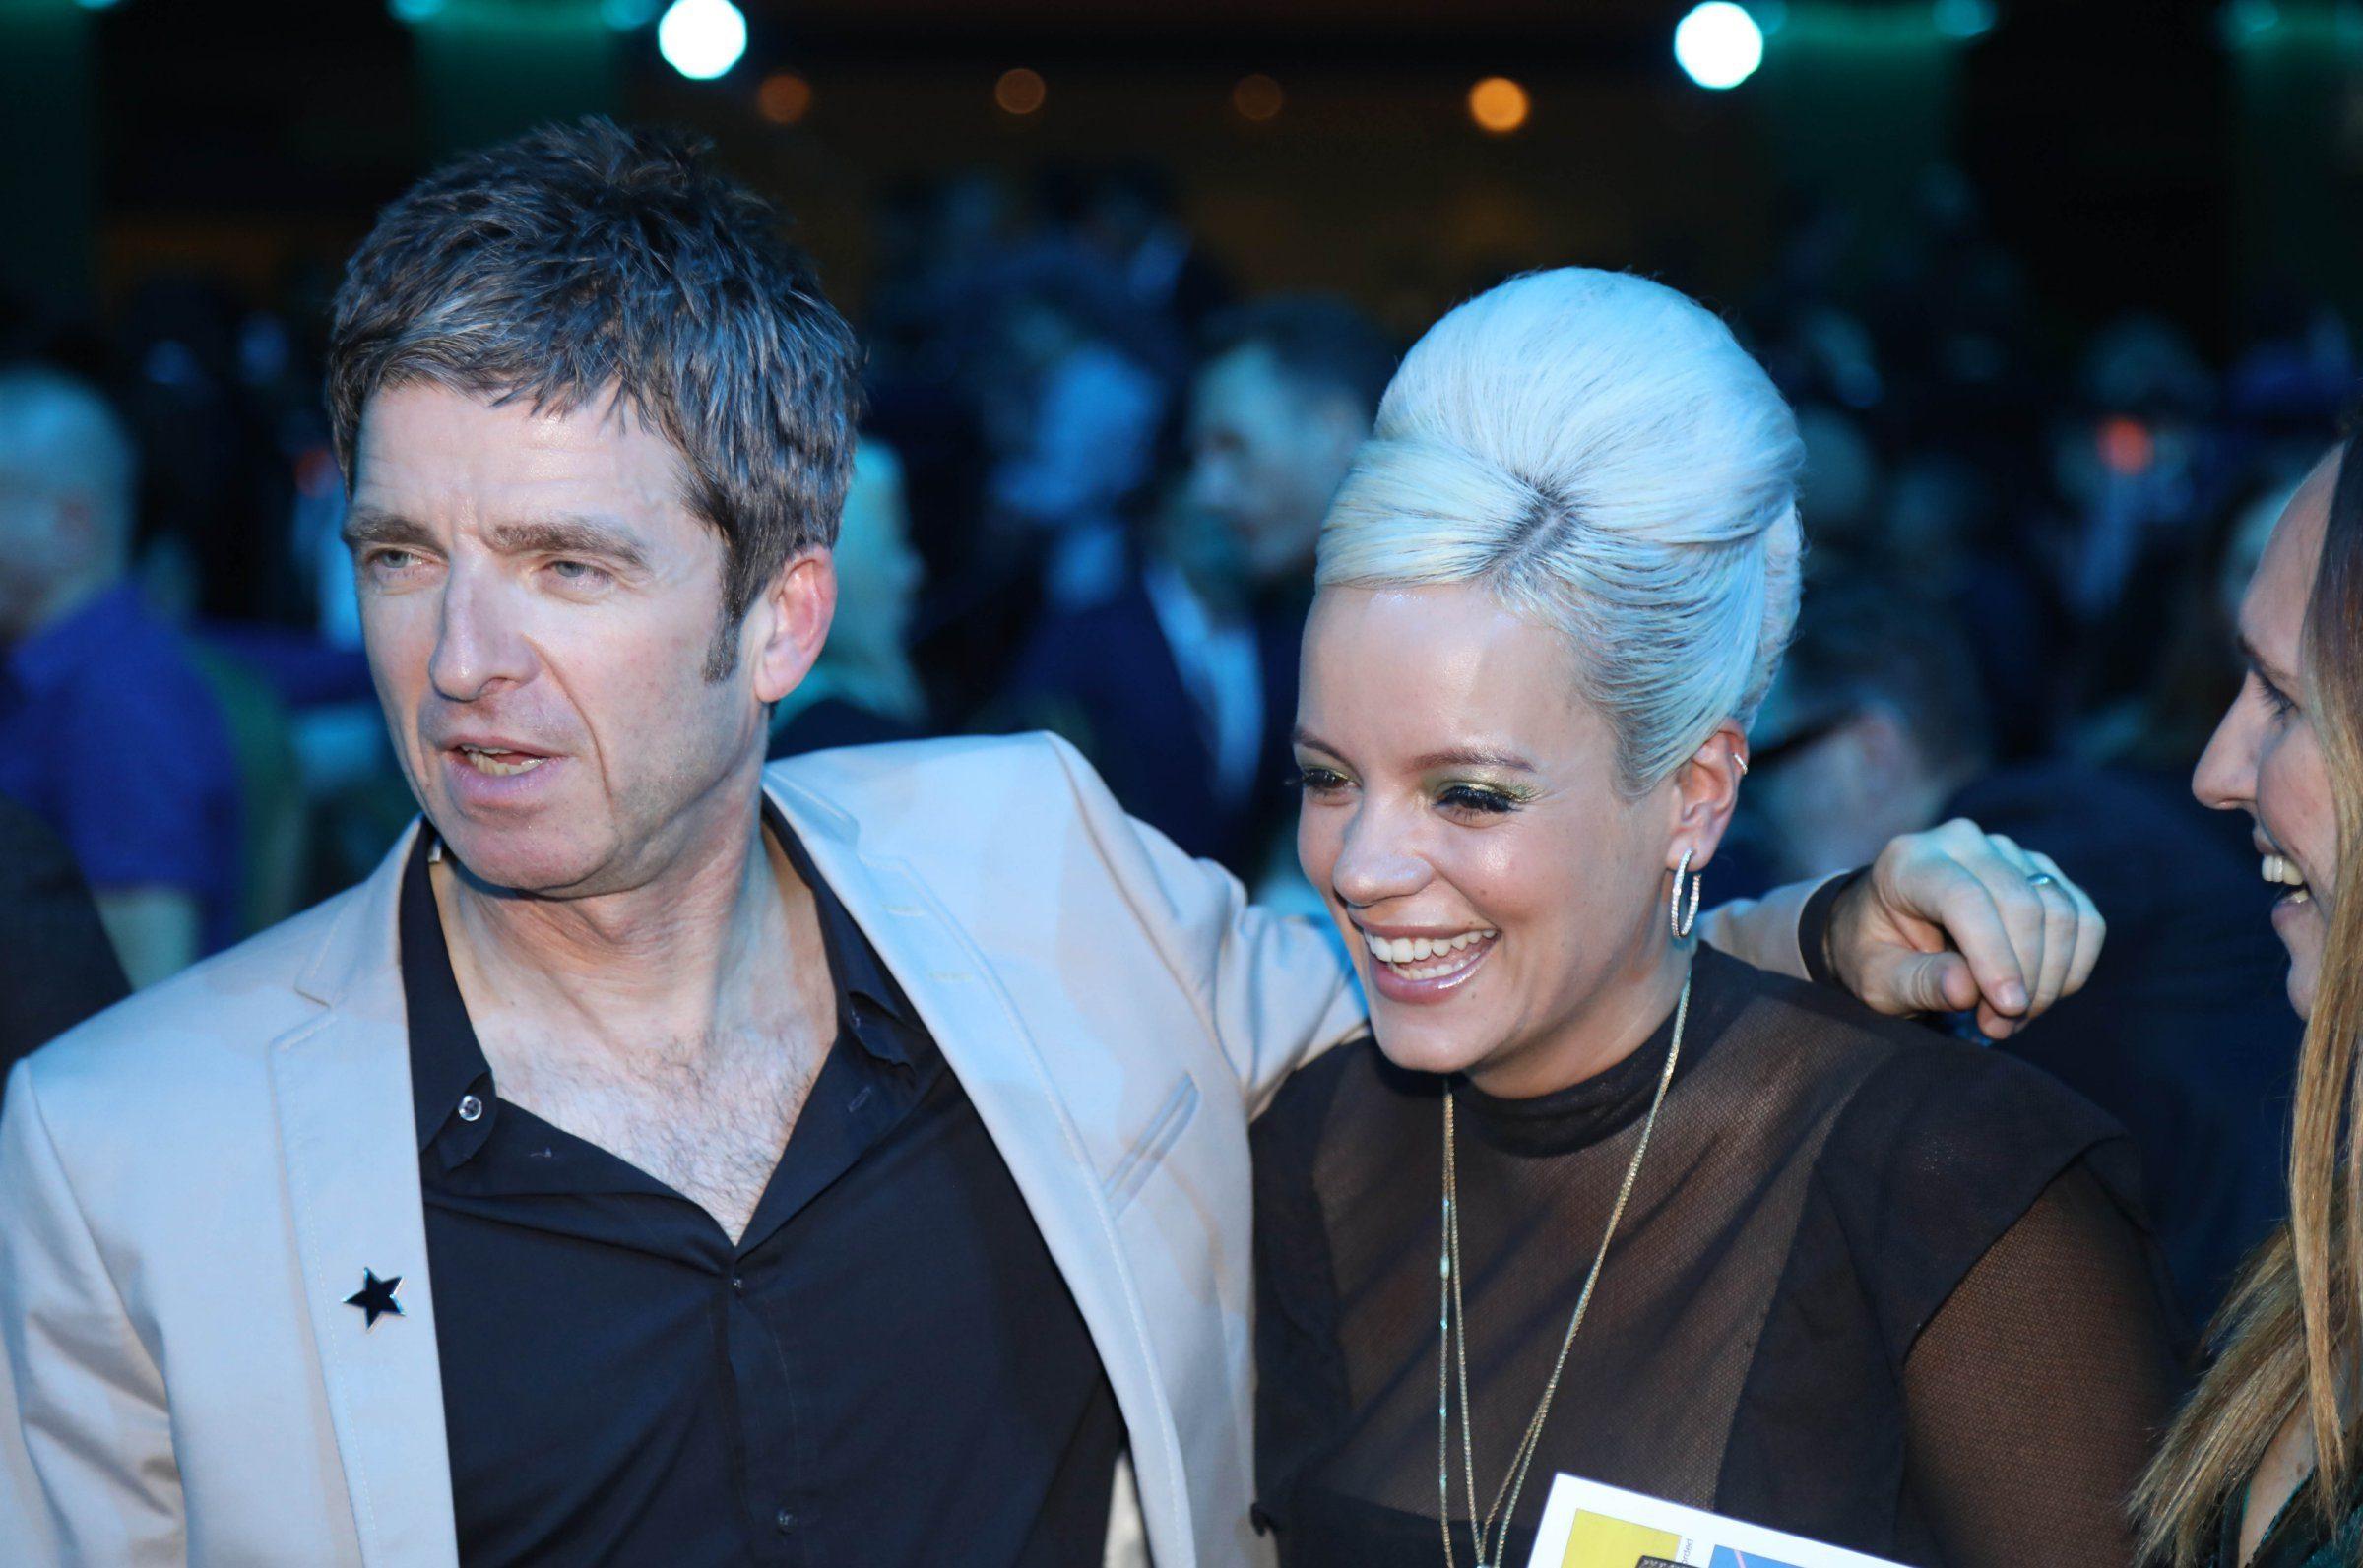 Mandatory Credit: Photo by JM Enternational/REX (9887963fq) Noel Gallagher embraces Lily Allen Mercury Prize Albums of the Year, London, UK - 20 Sep 2018